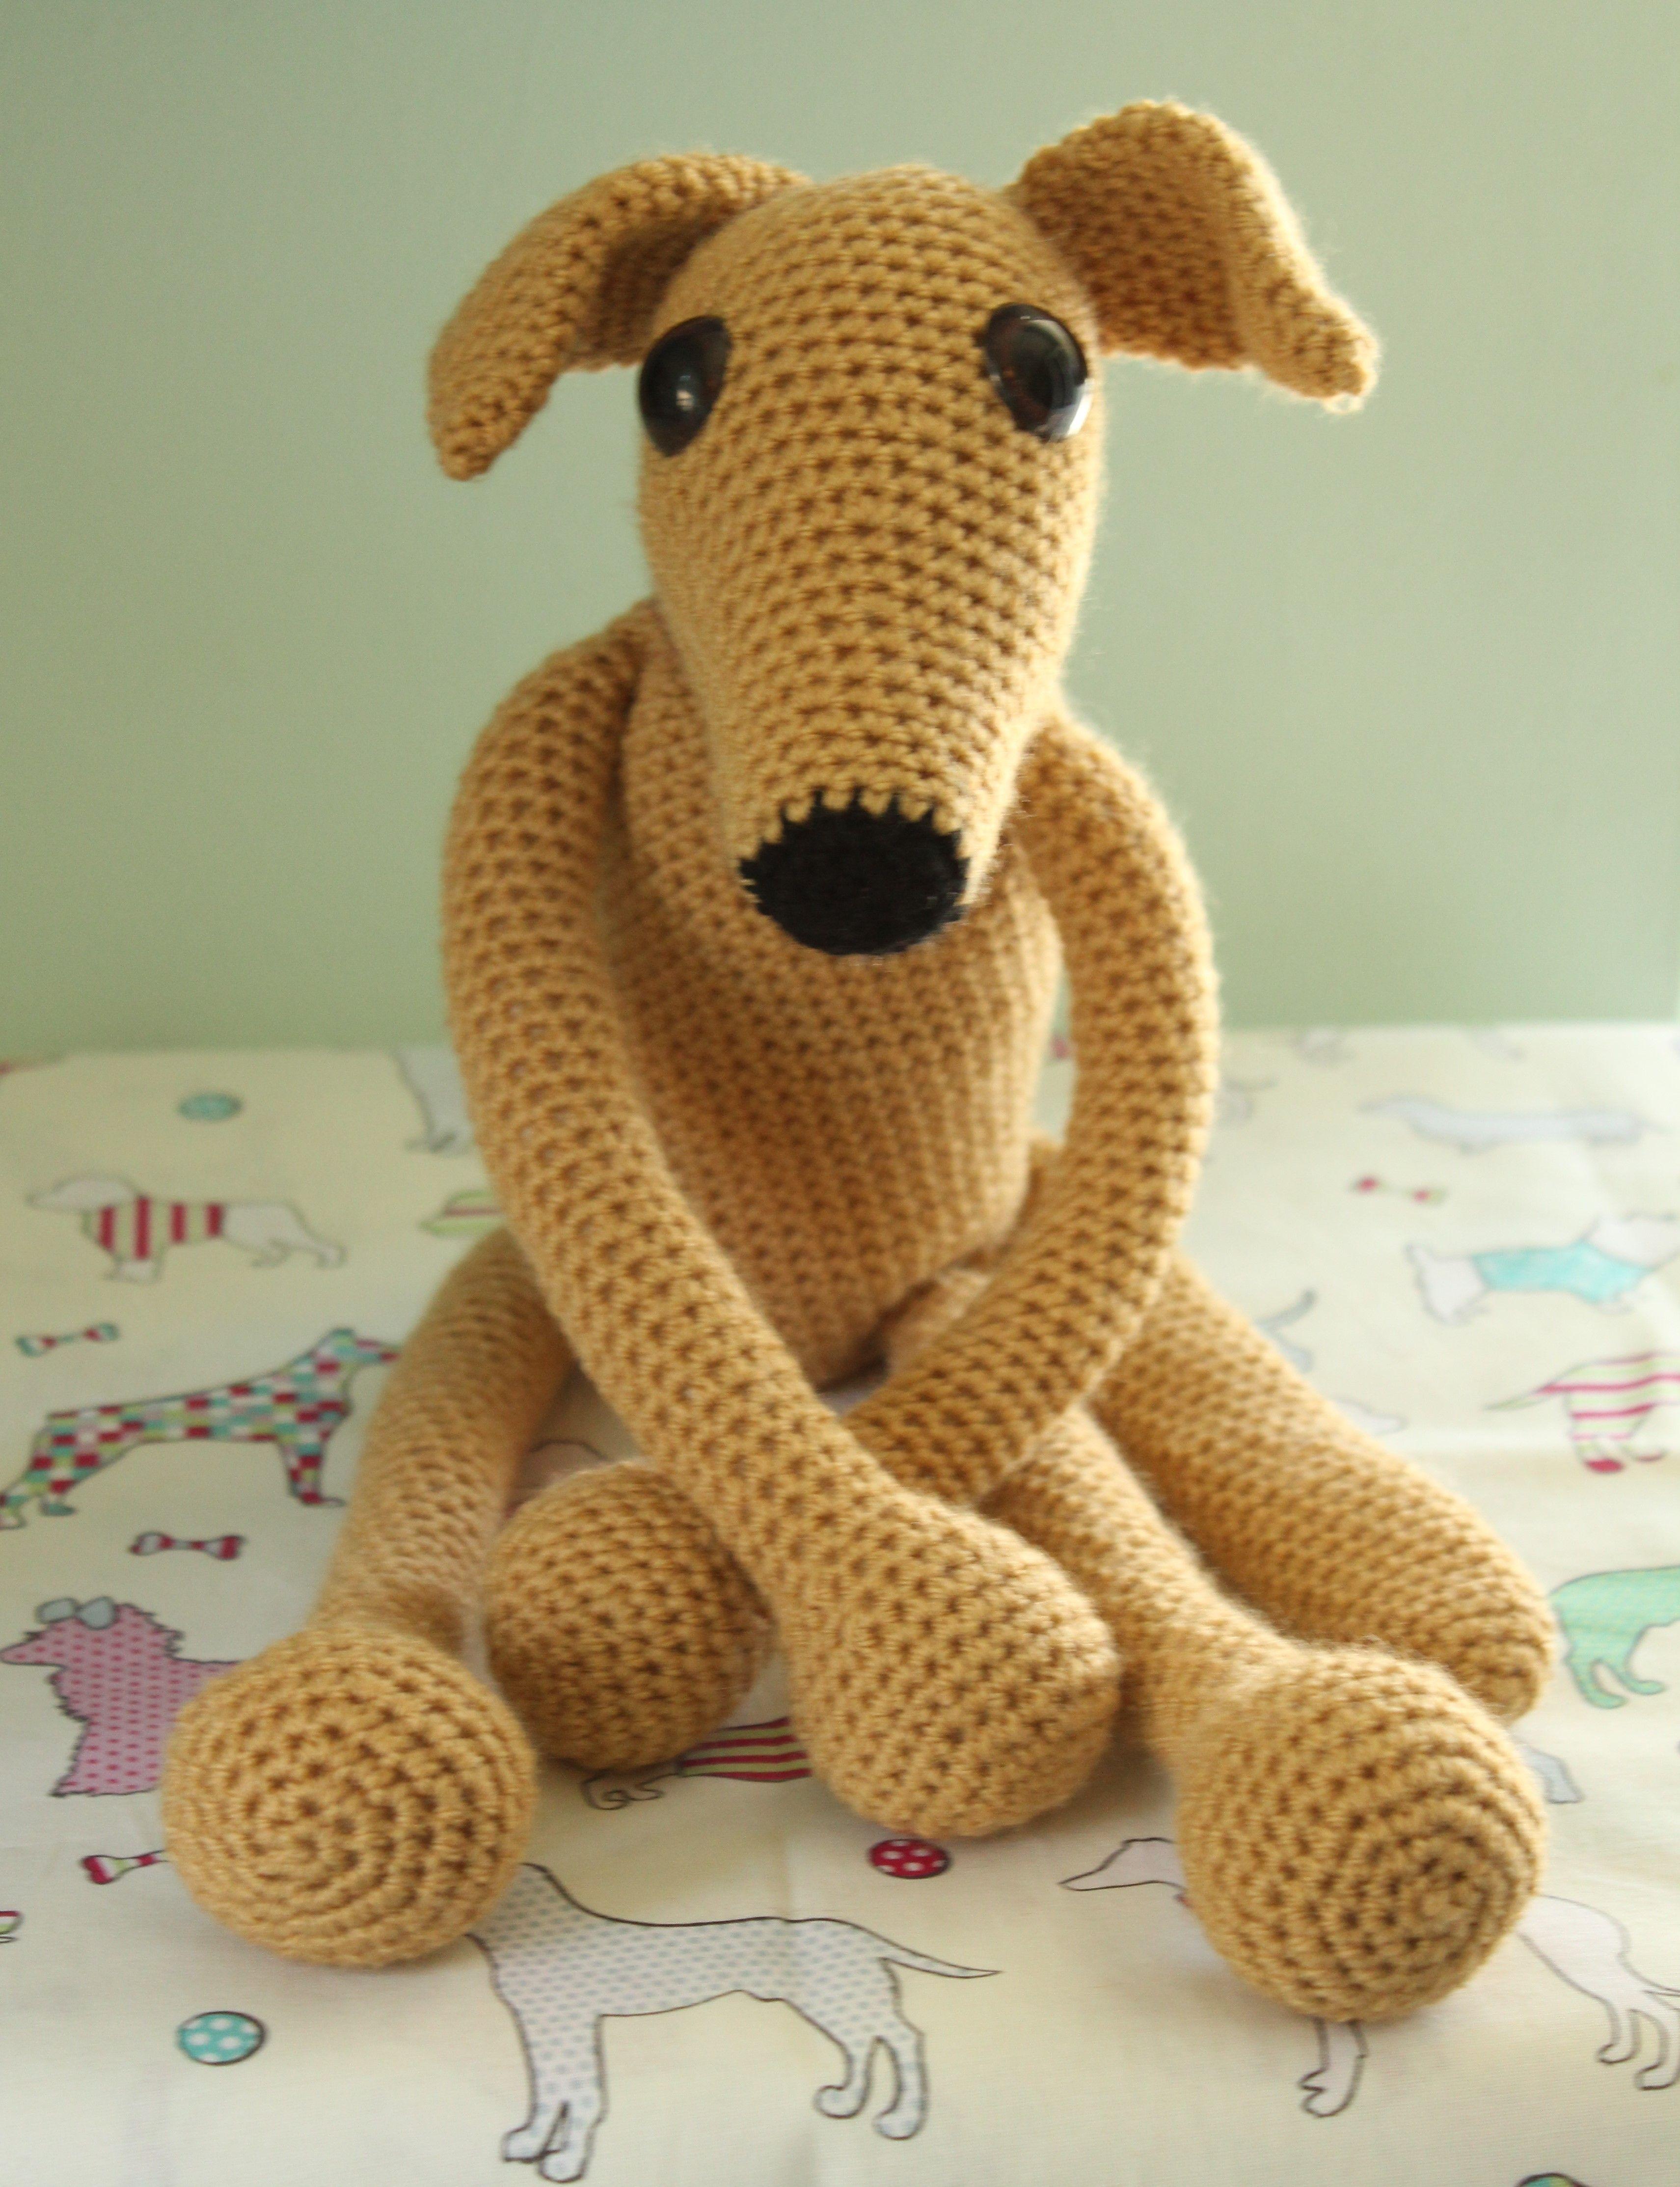 Greyhound Knitting Pattern Free : Greyhound whippet sighthound amigurumi crochet my design ...